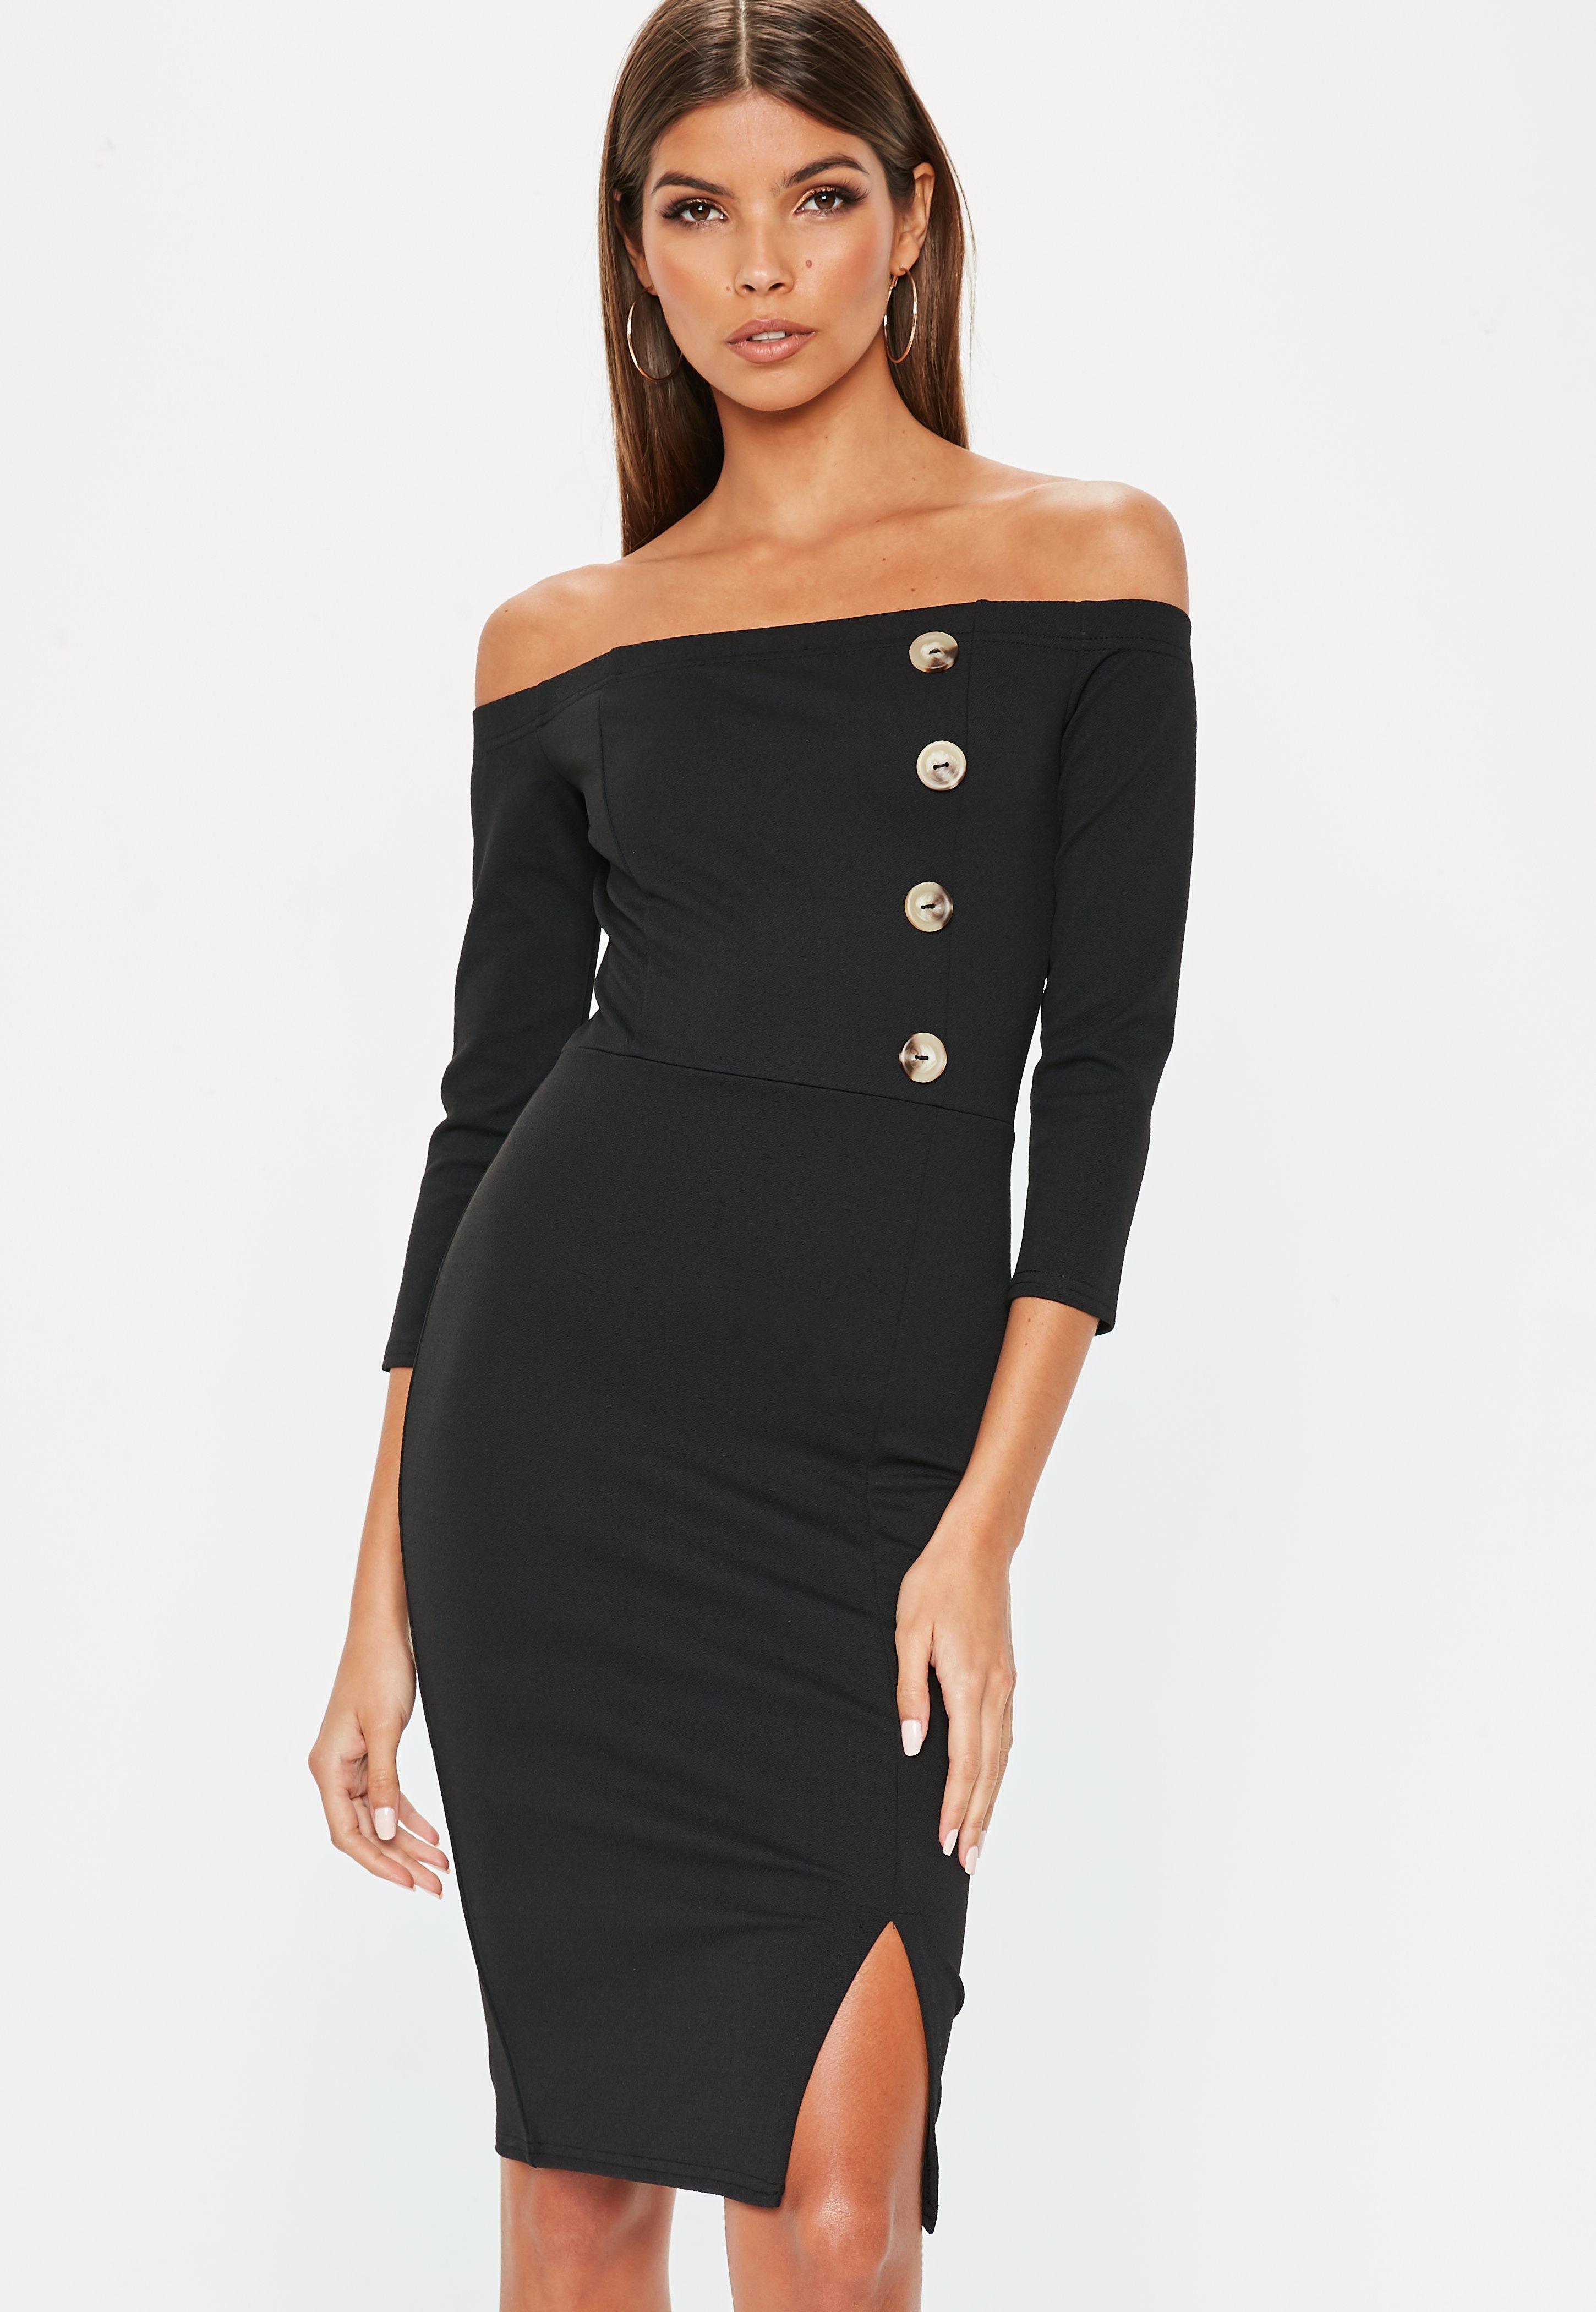 b99ed00b22a2d Lyst - Missguided Black Horn Button Bardot Midi Dress in Black